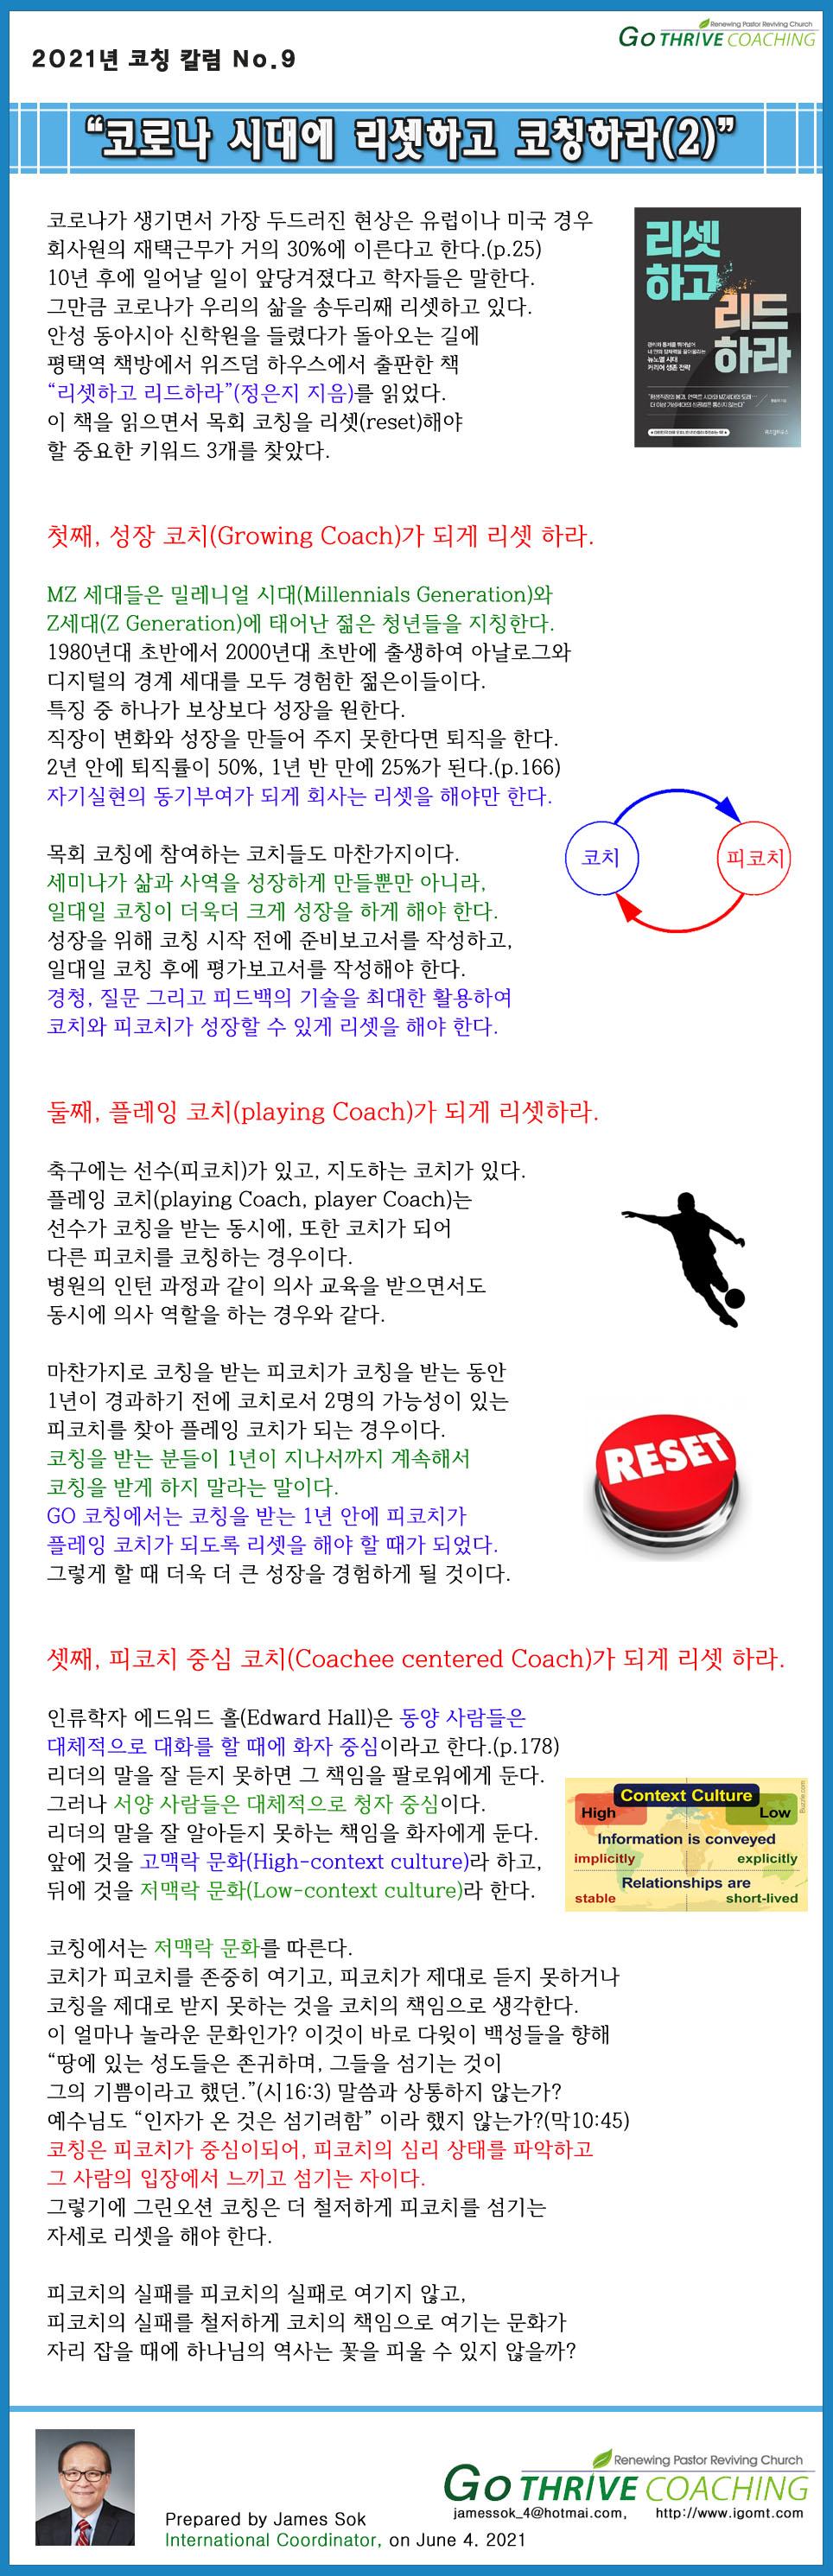 coaching_Column_2021_No9_a.jpg